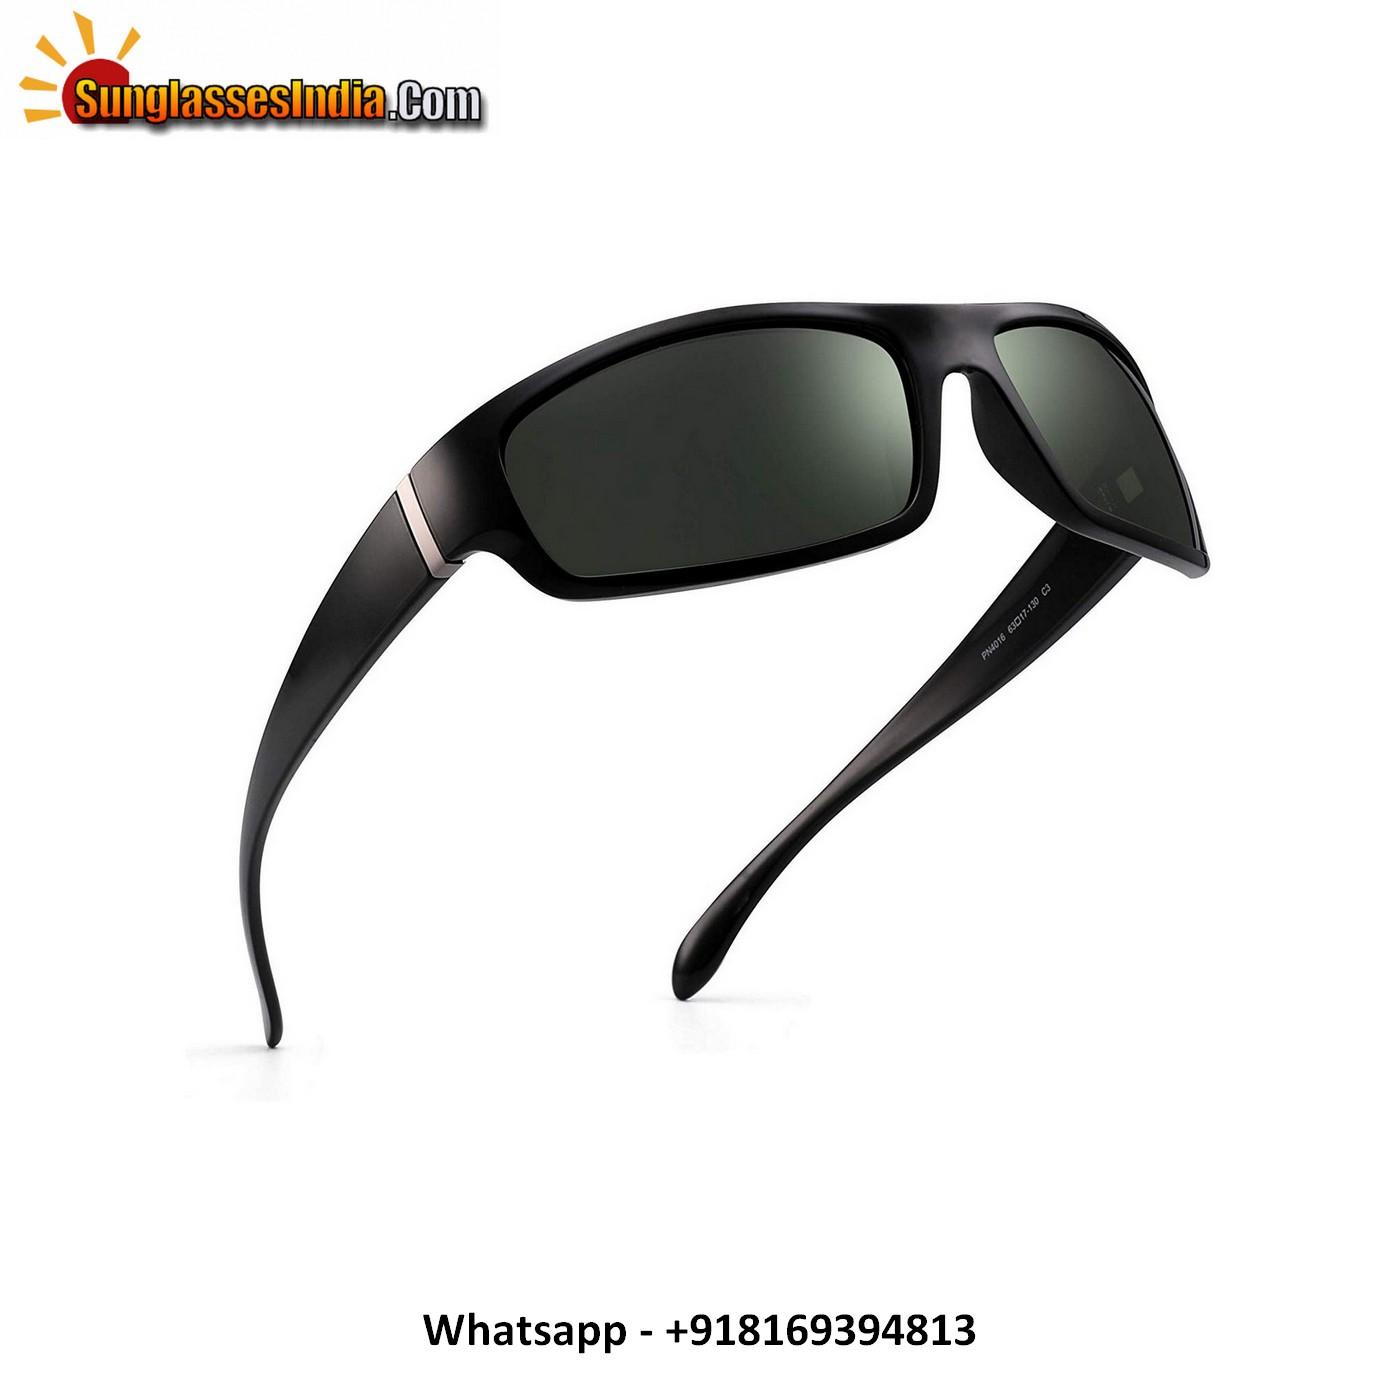 Polarized Sport Sunglasses for Men Women Baseball Running Cycling Fishing Driving Golf